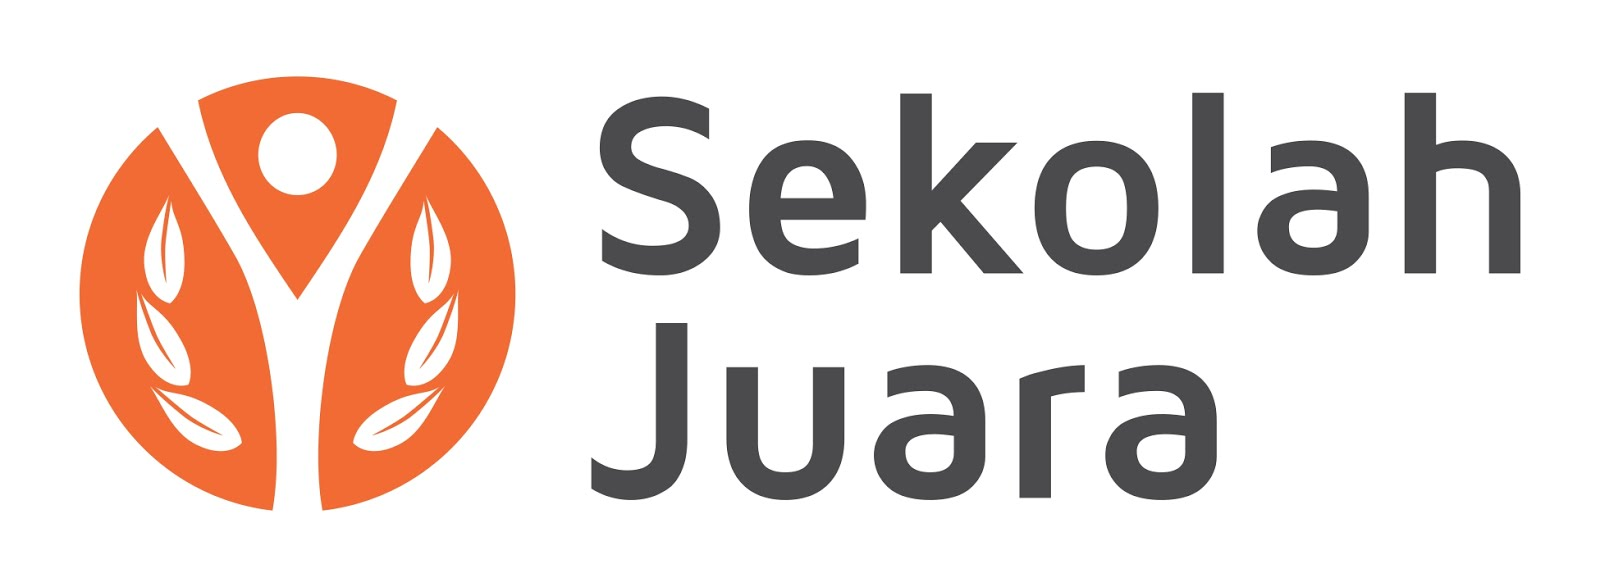 SD Juara Pekanbaru